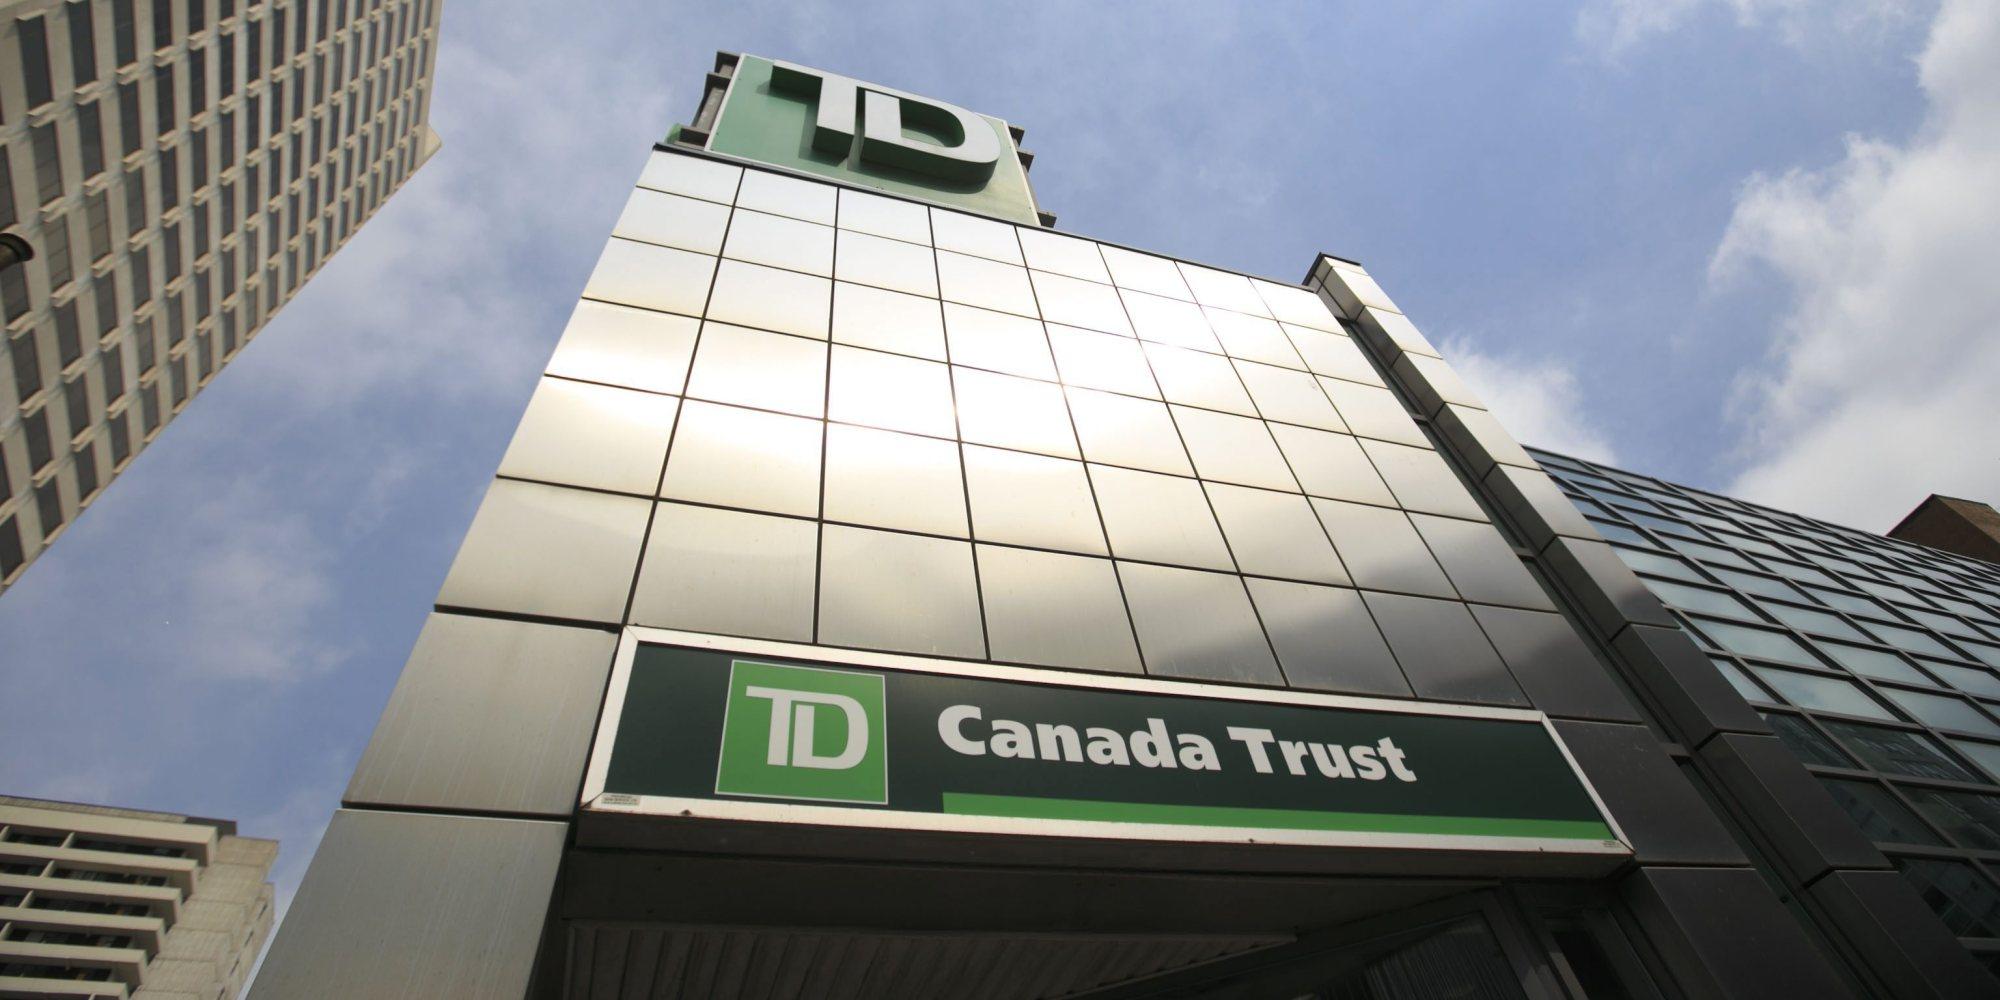 Td Bank Car Loan >> Couple Feel 'Robbed' By 25% Interest TD Car Loan